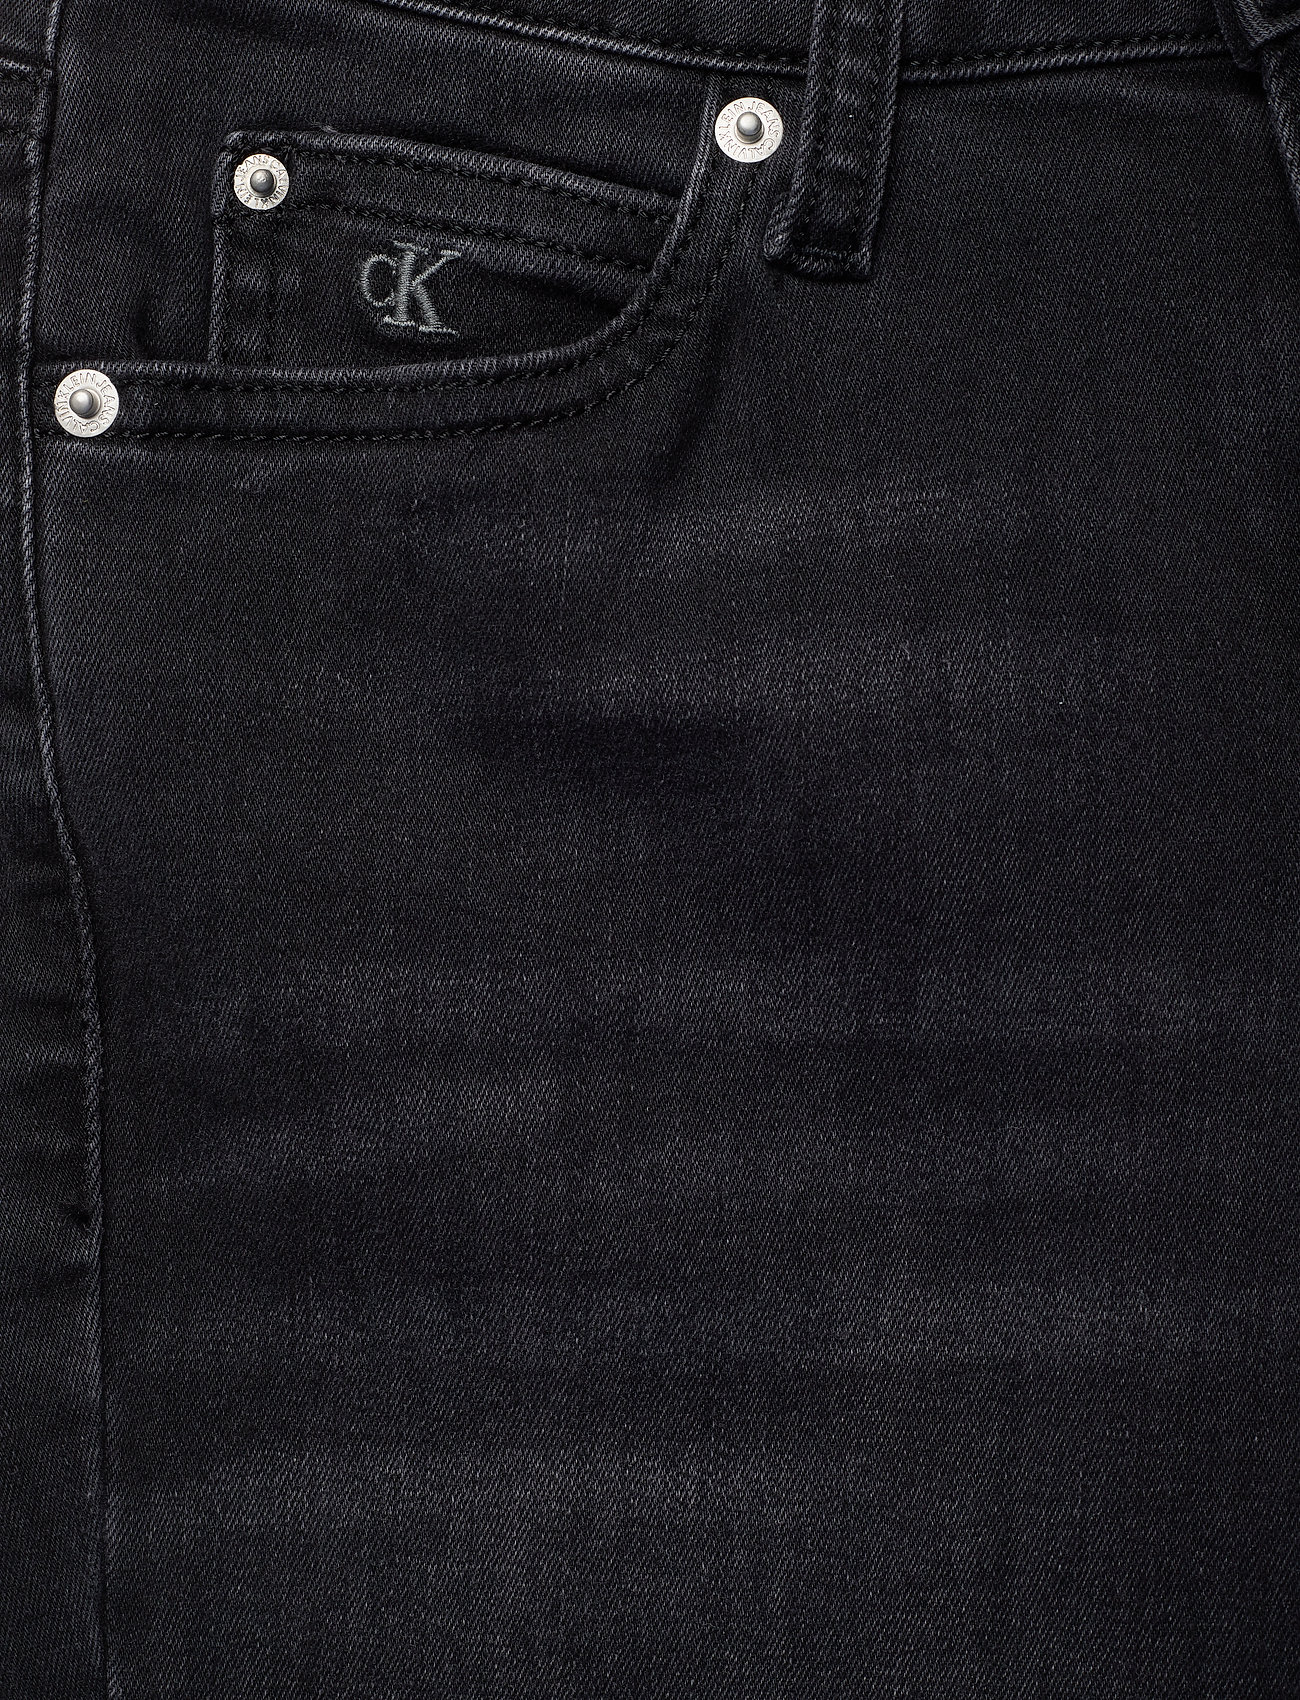 Ckj 011 Mid Rise Ski (Zz002 Washed Black) (1100 kr) - Calvin Klein Jeans